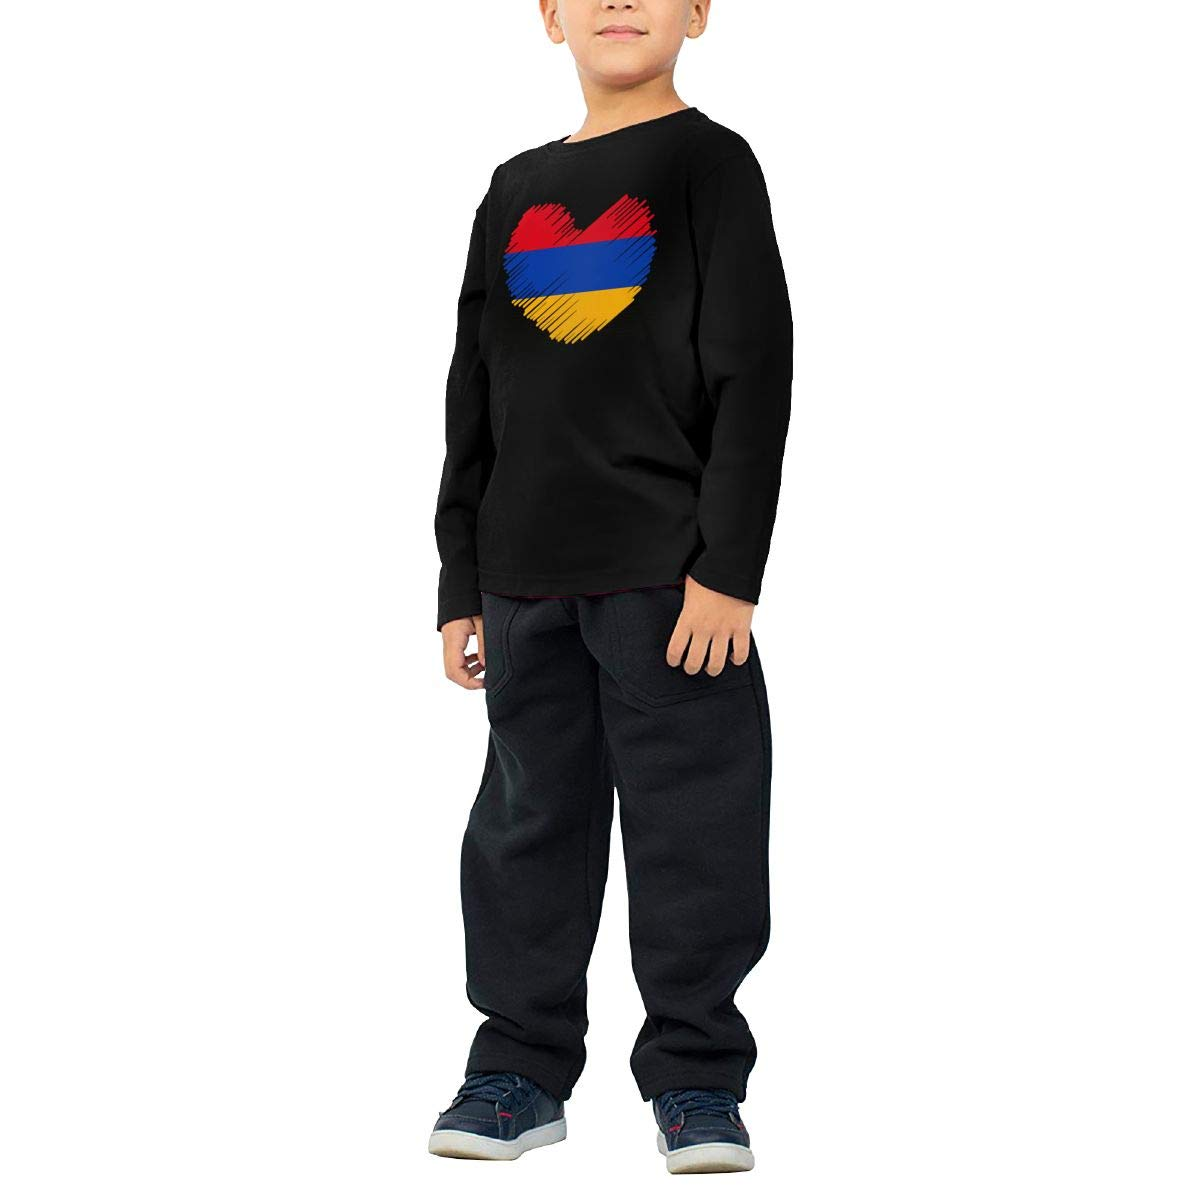 Toddler Armenia Flag in Heart Shape ComfortSoft Long Sleeve Shirt